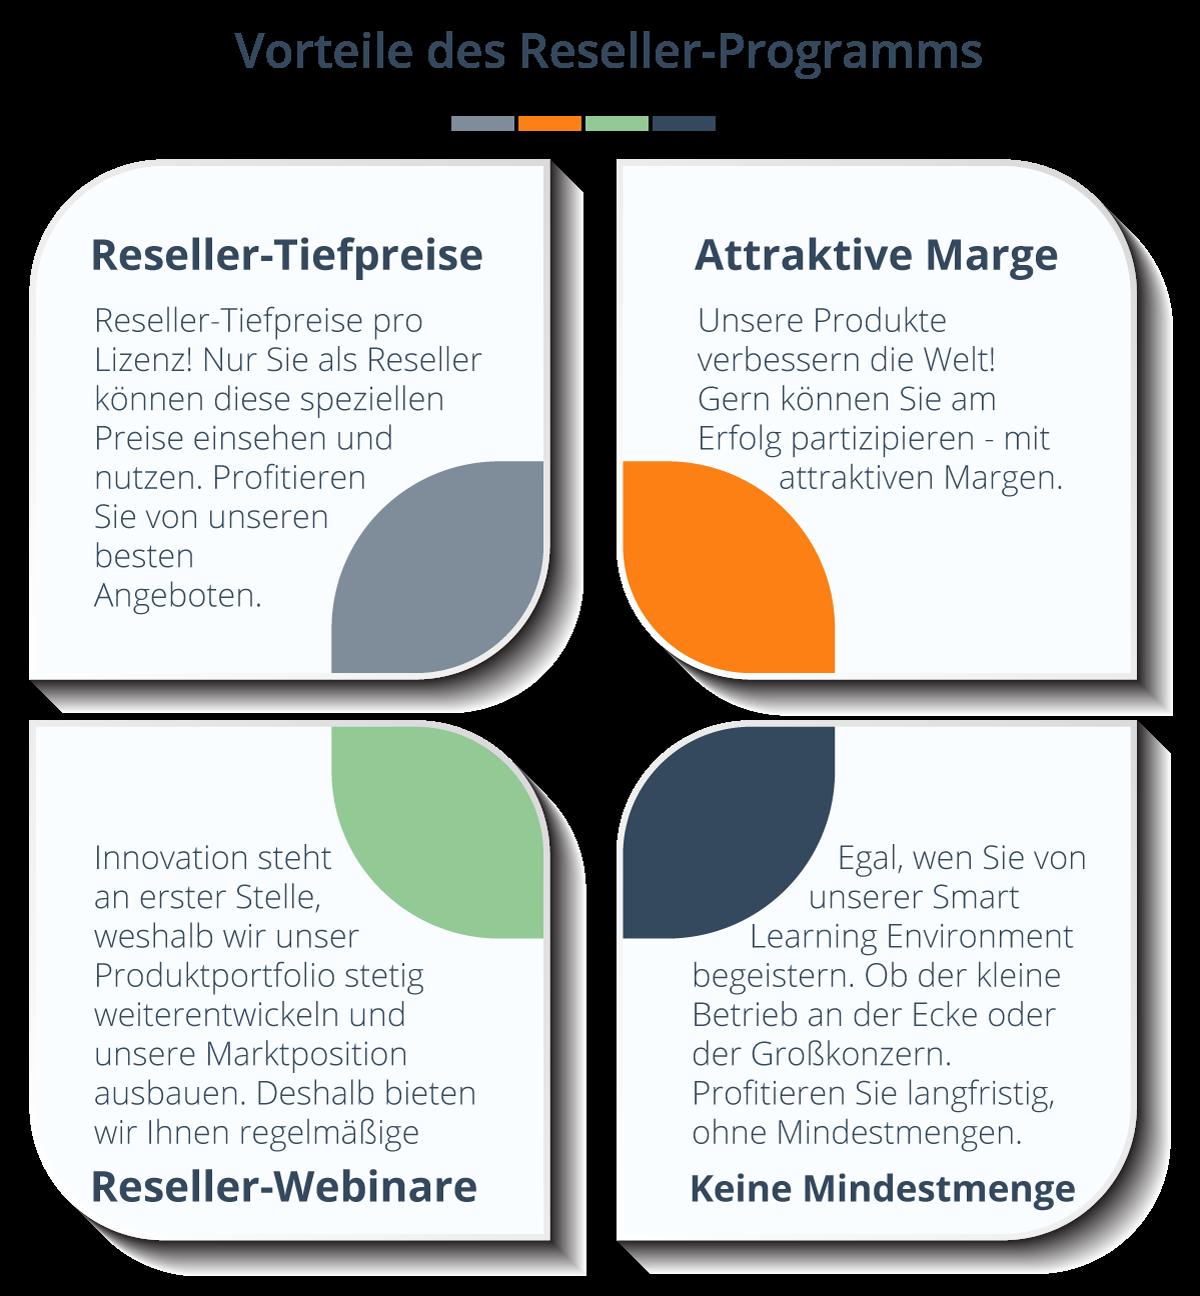 Vorteile des Reseller-Programms